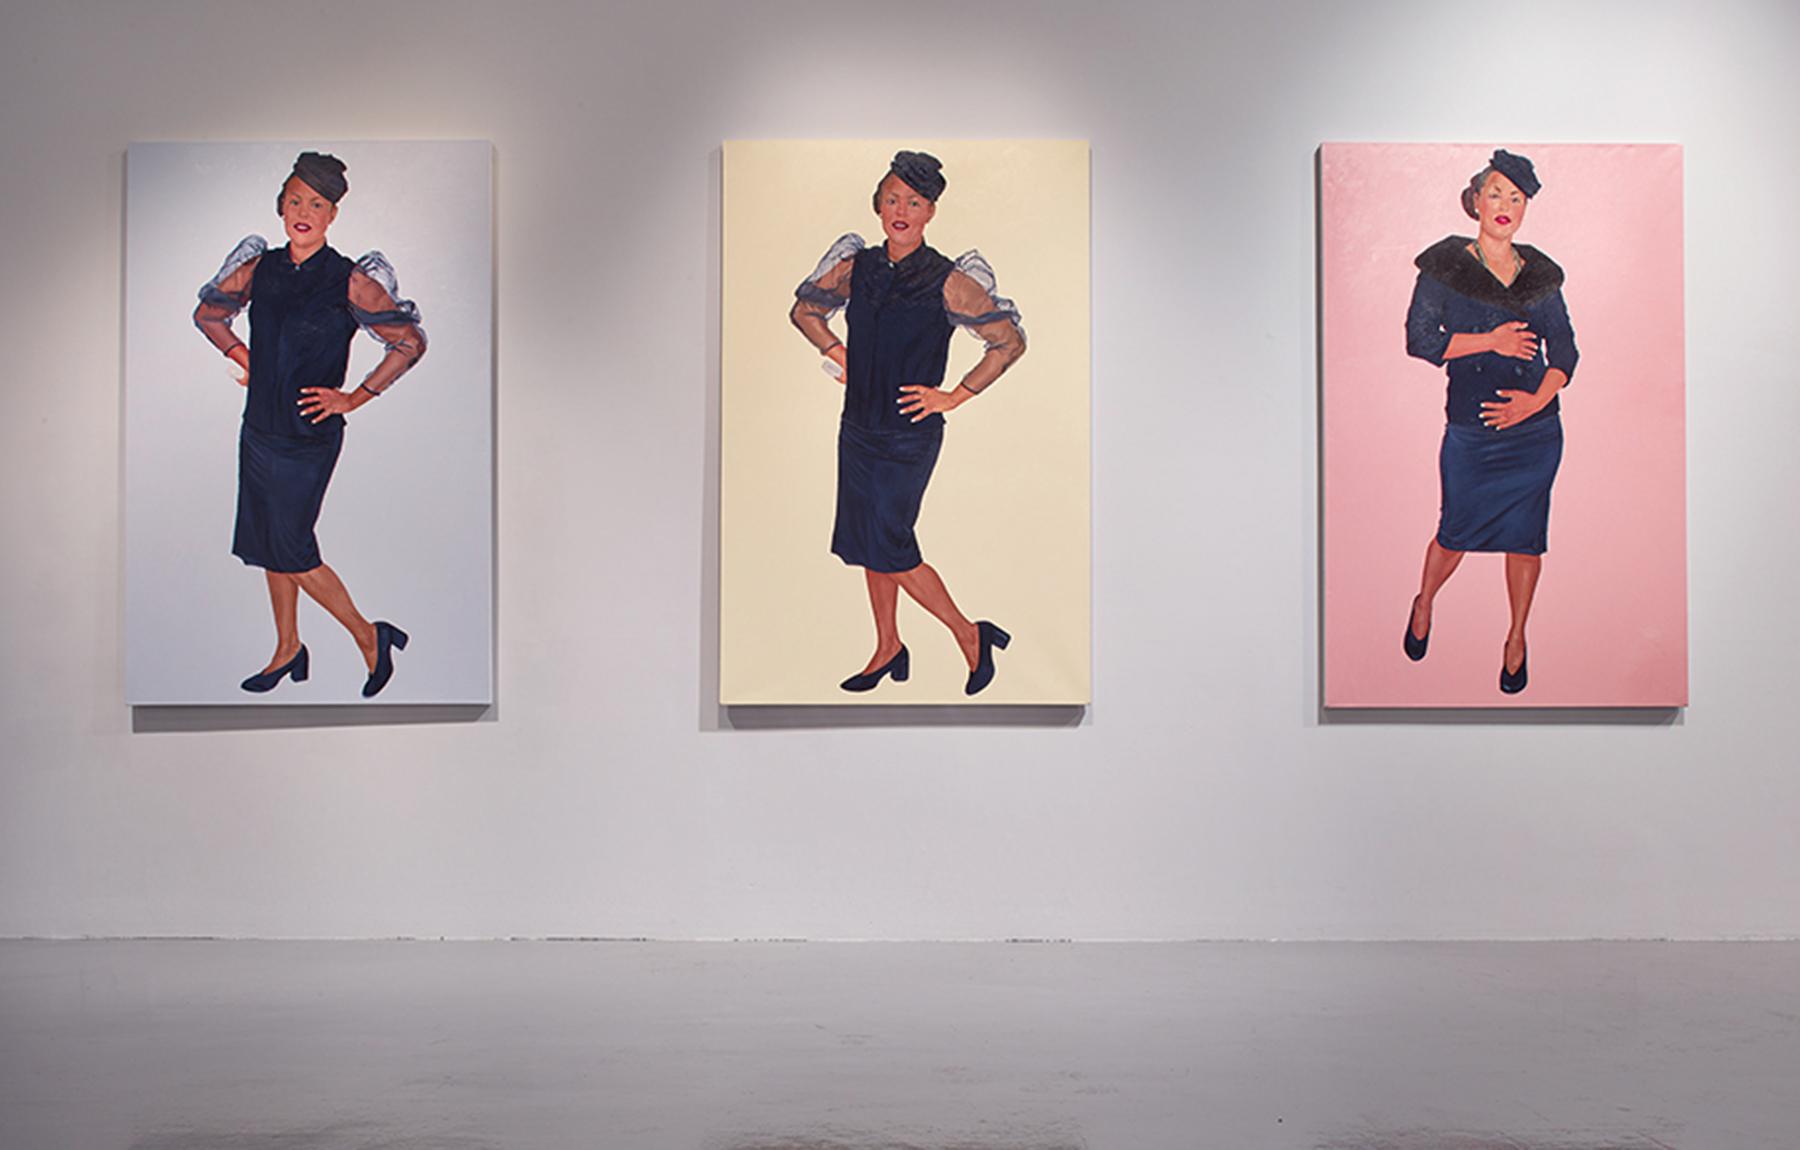 Installation View, Eugene Palmer, Didn't it Rain, Black I (blue), Black II (yellow), Black (pink) oil on canvas, 240cm x 155cm, 2018 Photography- Steve White